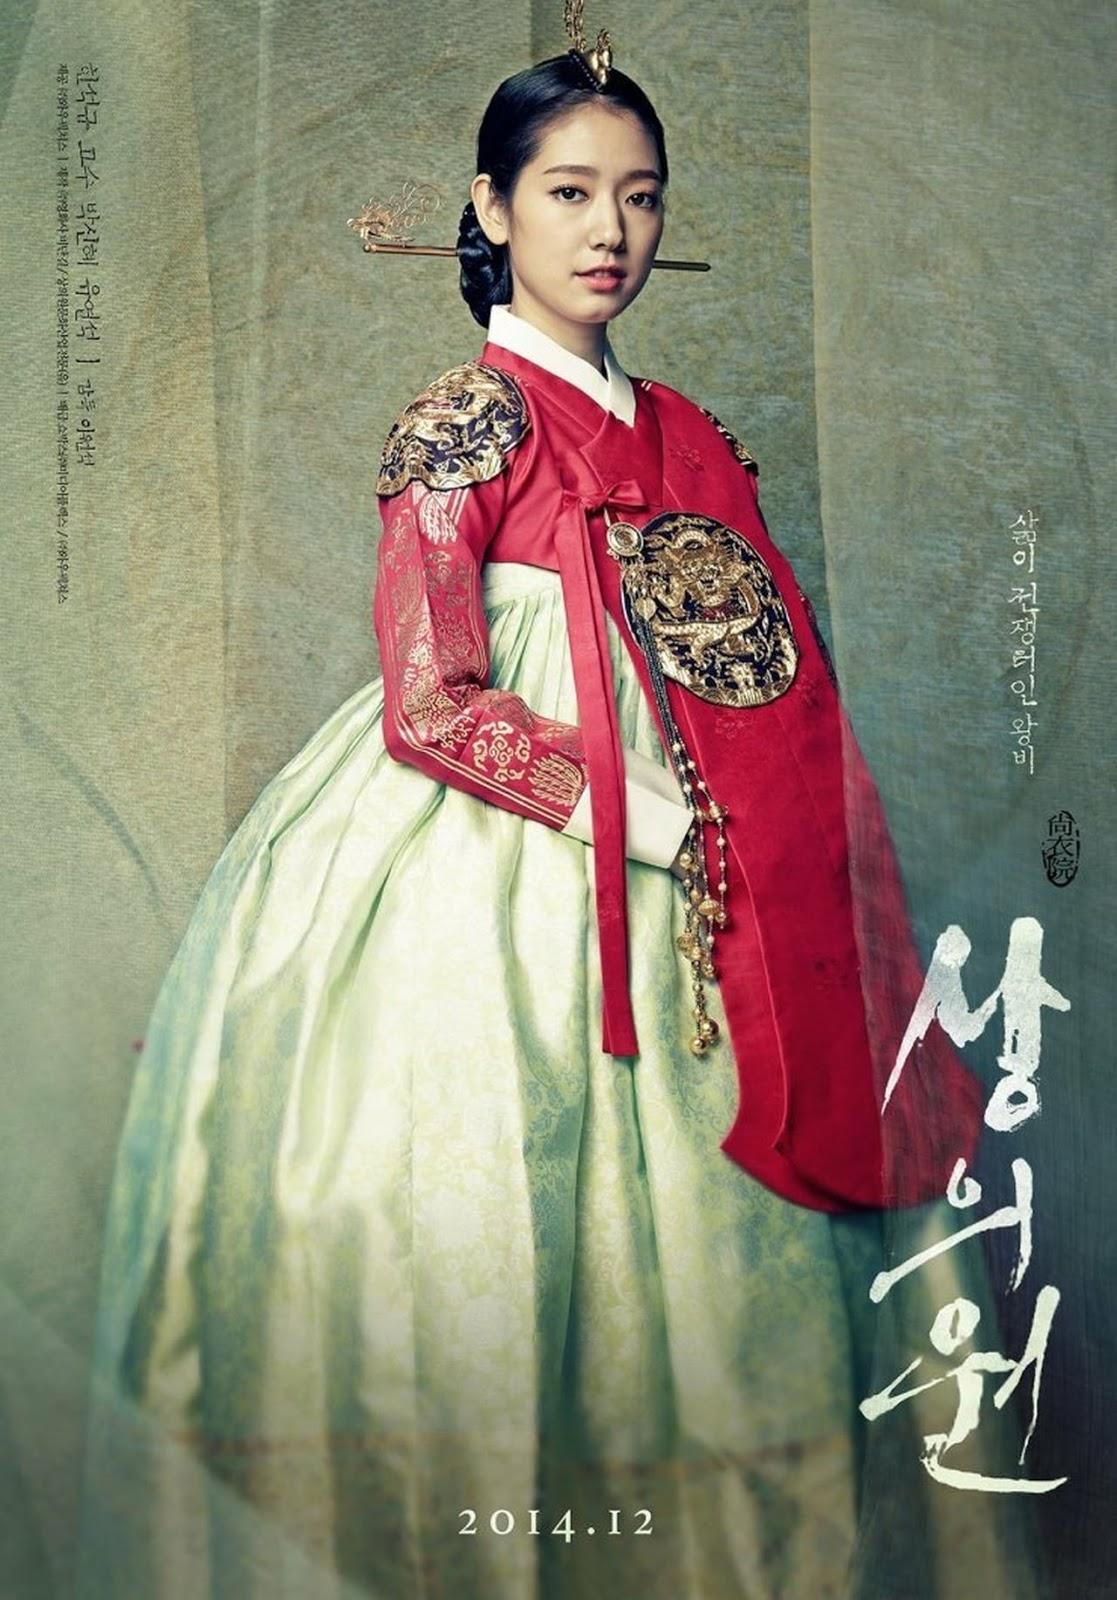 ROYAL TAILOR: Kisah Tentang Seorang Ratu dan Penjahit Kerajaan